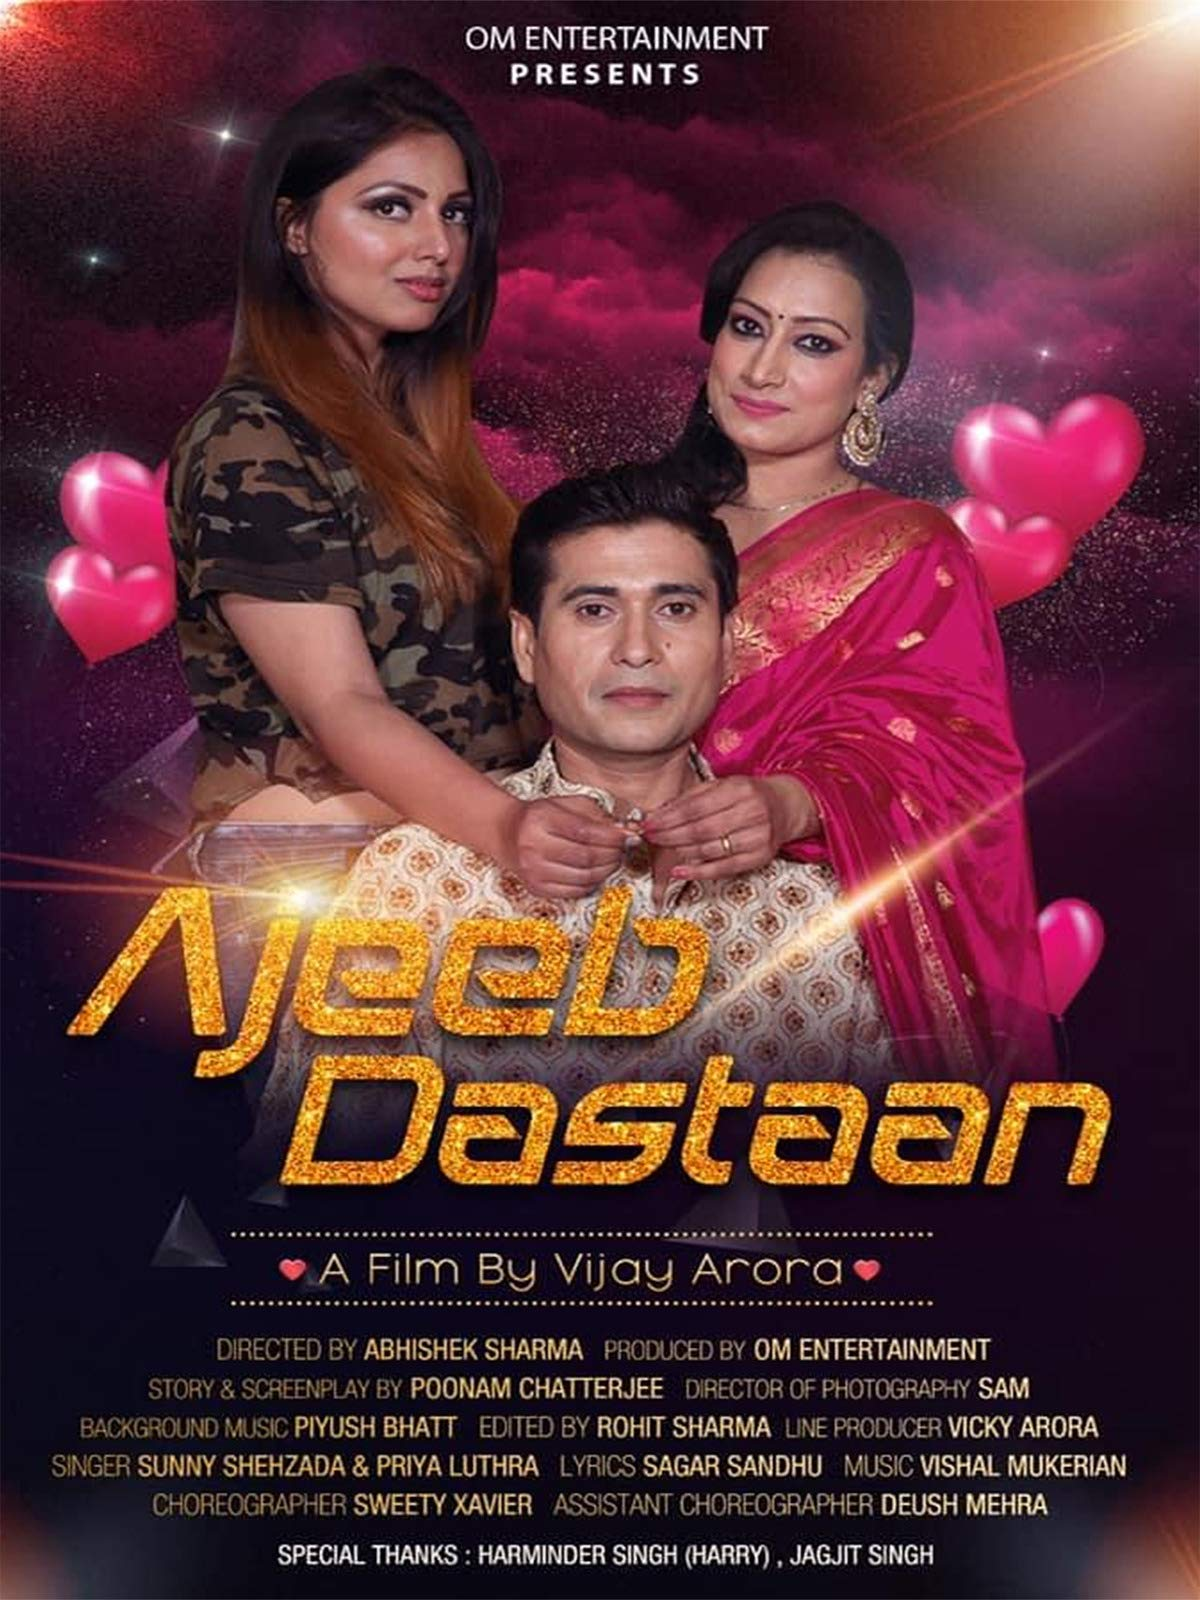 Ajeeb Dastaan - A Film By Vijay Arora